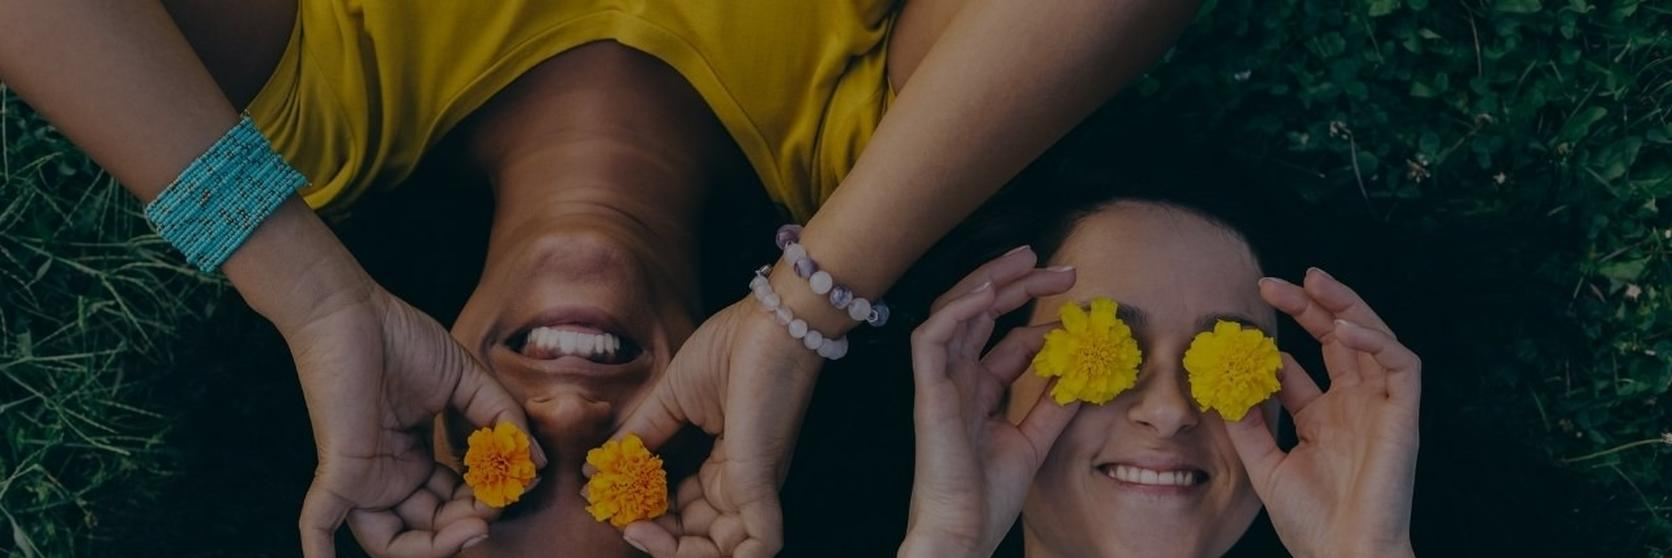 Untitled-design-2020-10-27T170028804-flower-eyes